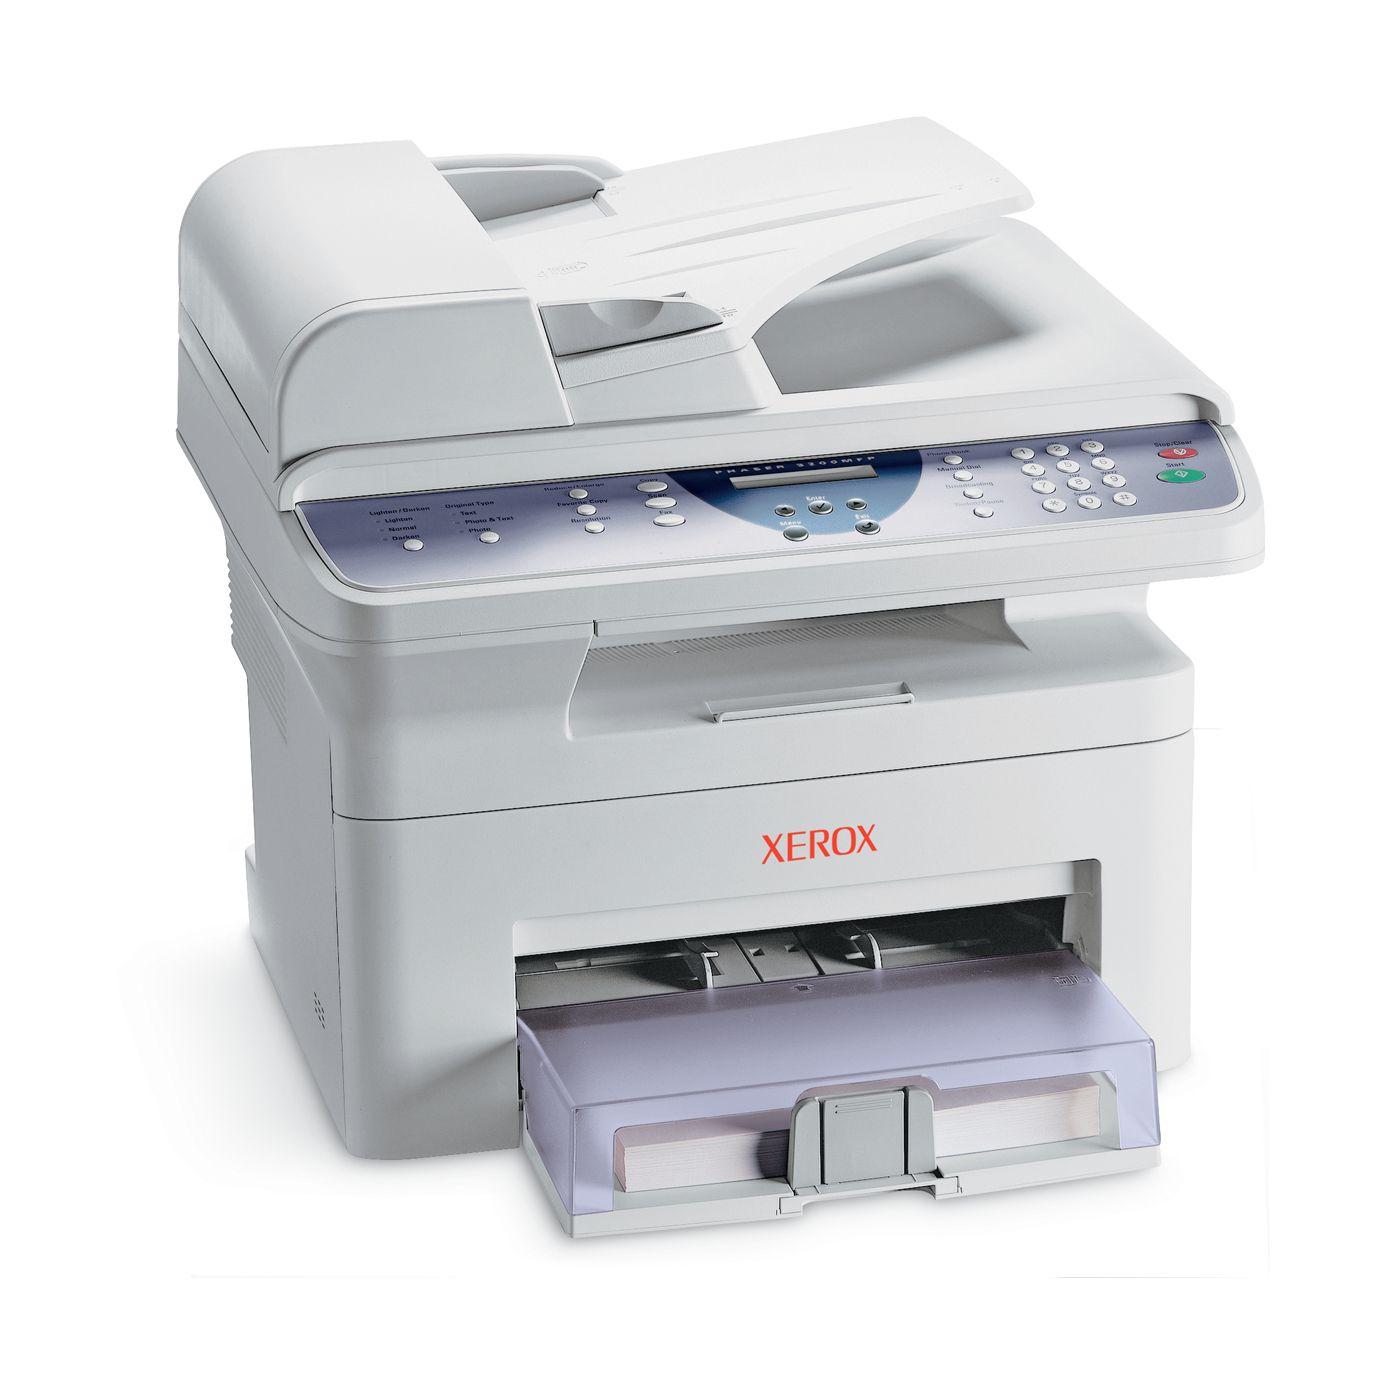 Xerox 3200 MFP